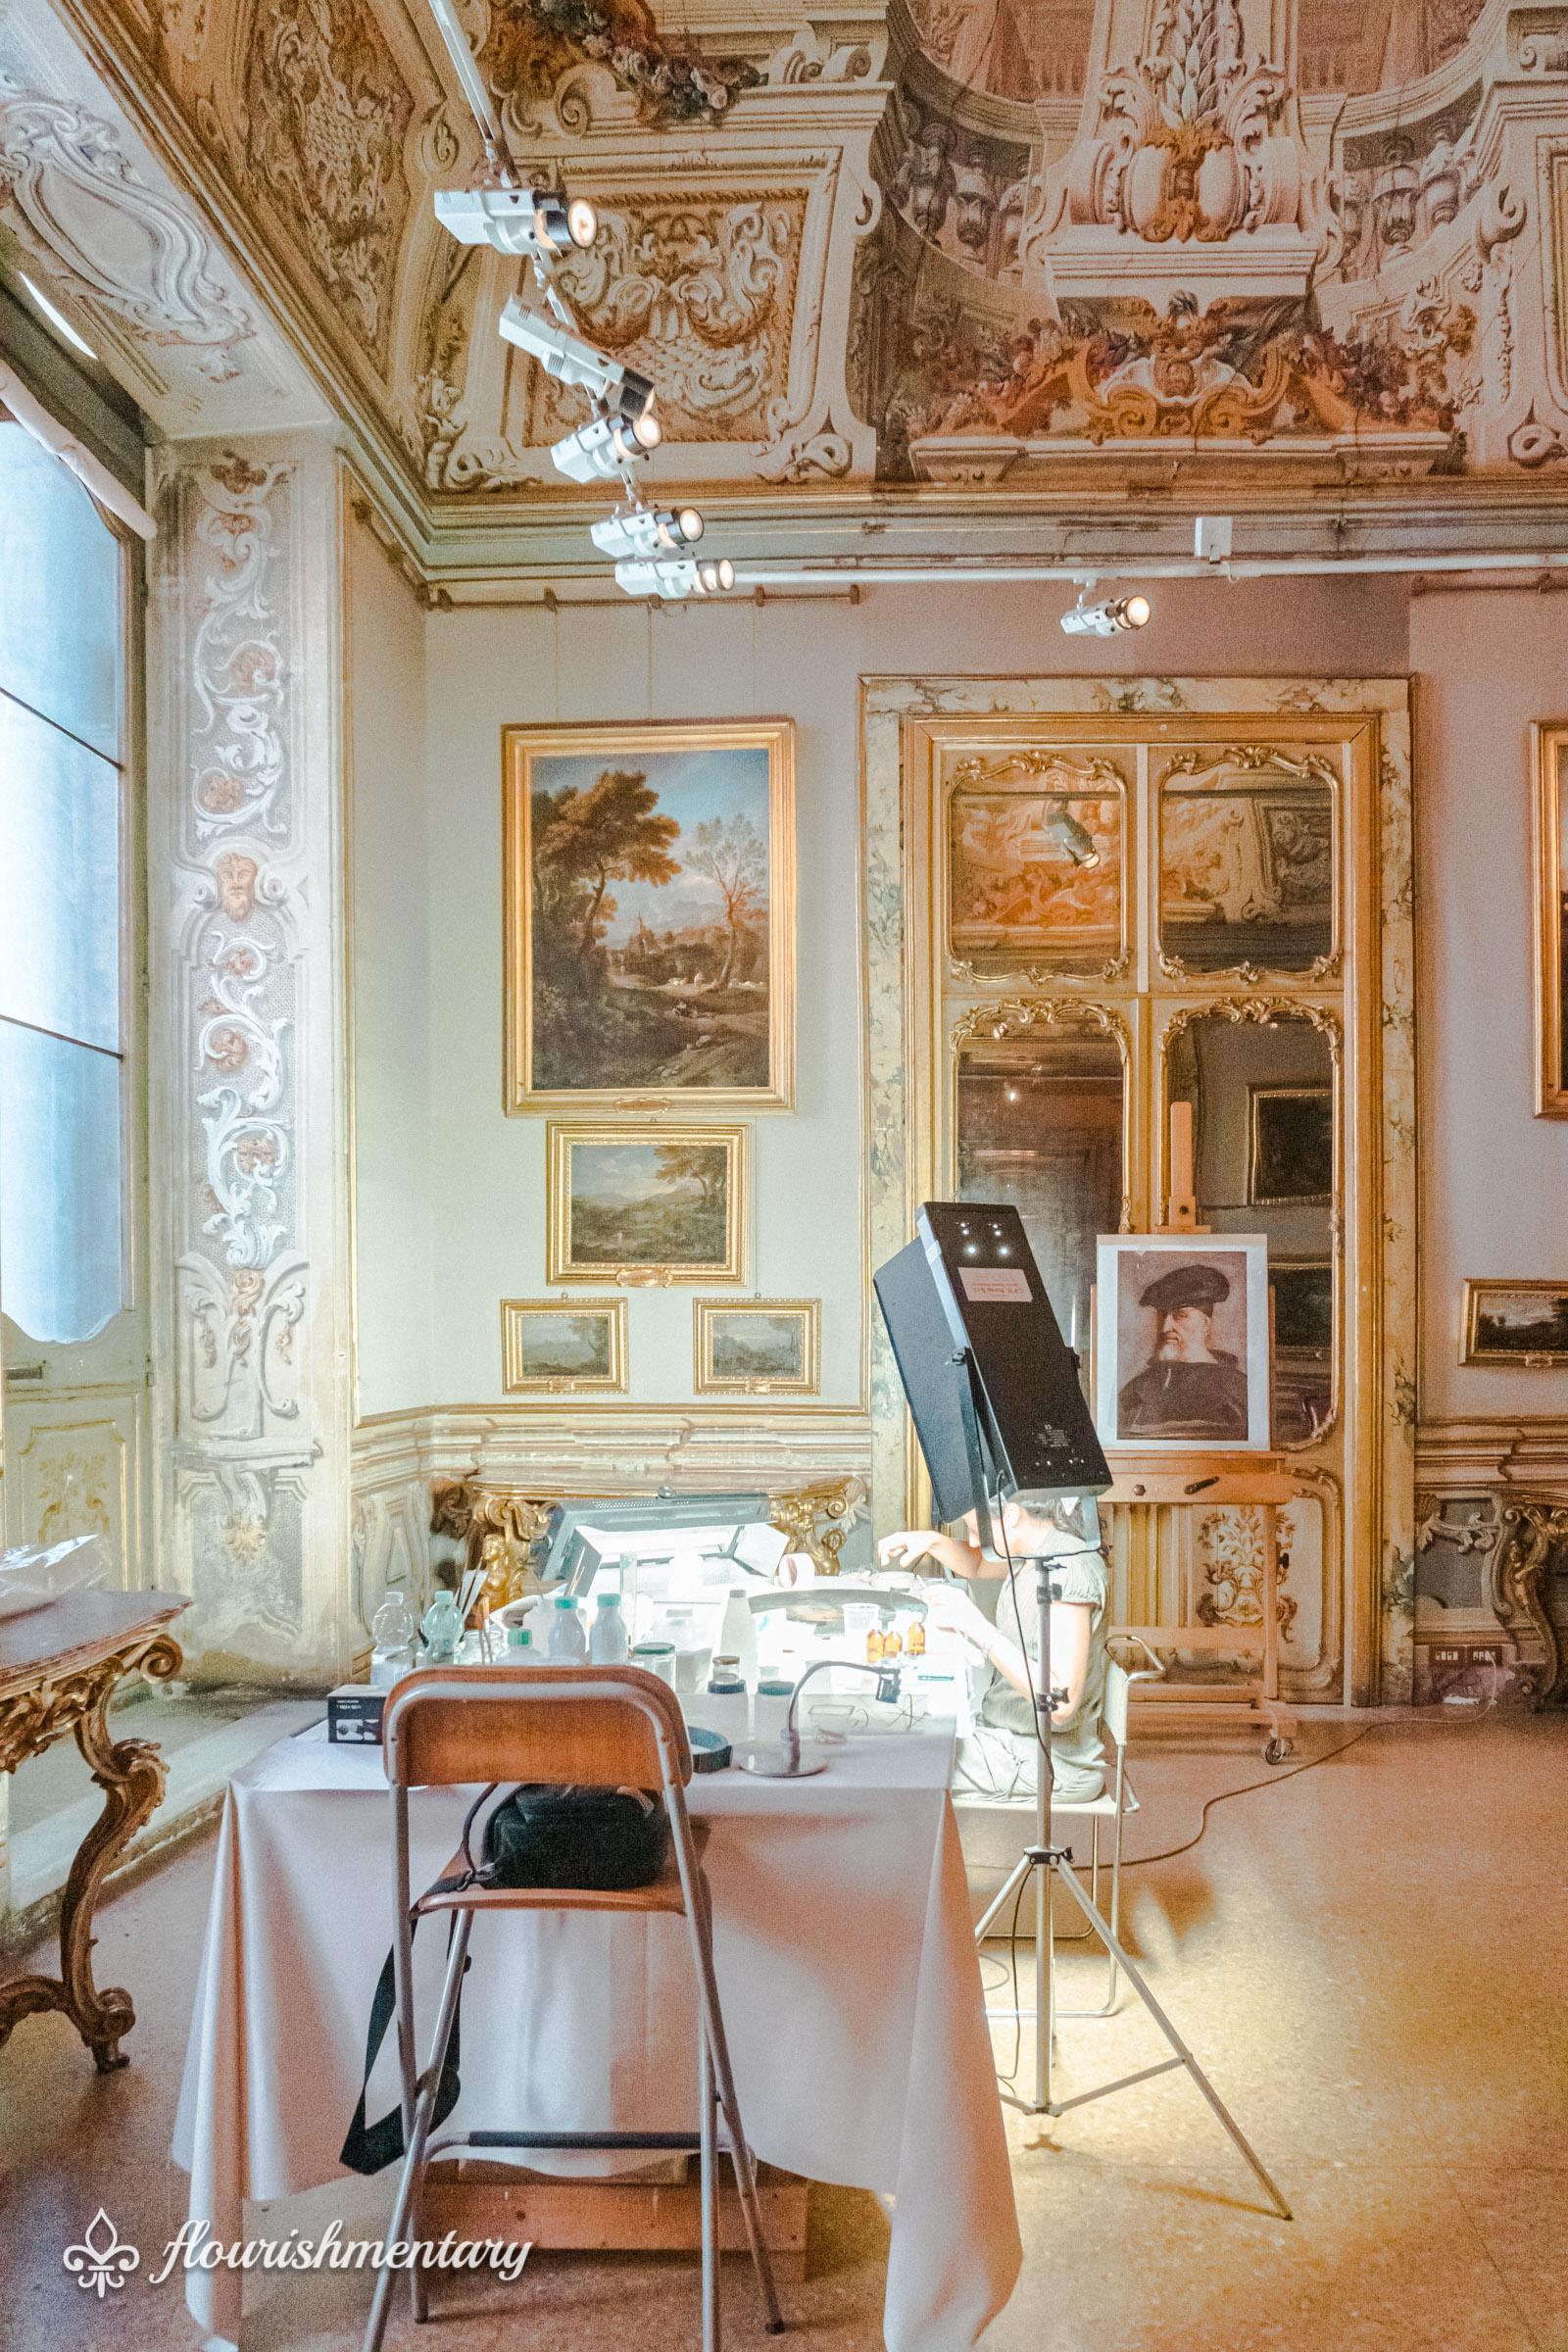 painting restoration Galleria Doria Pamphilj